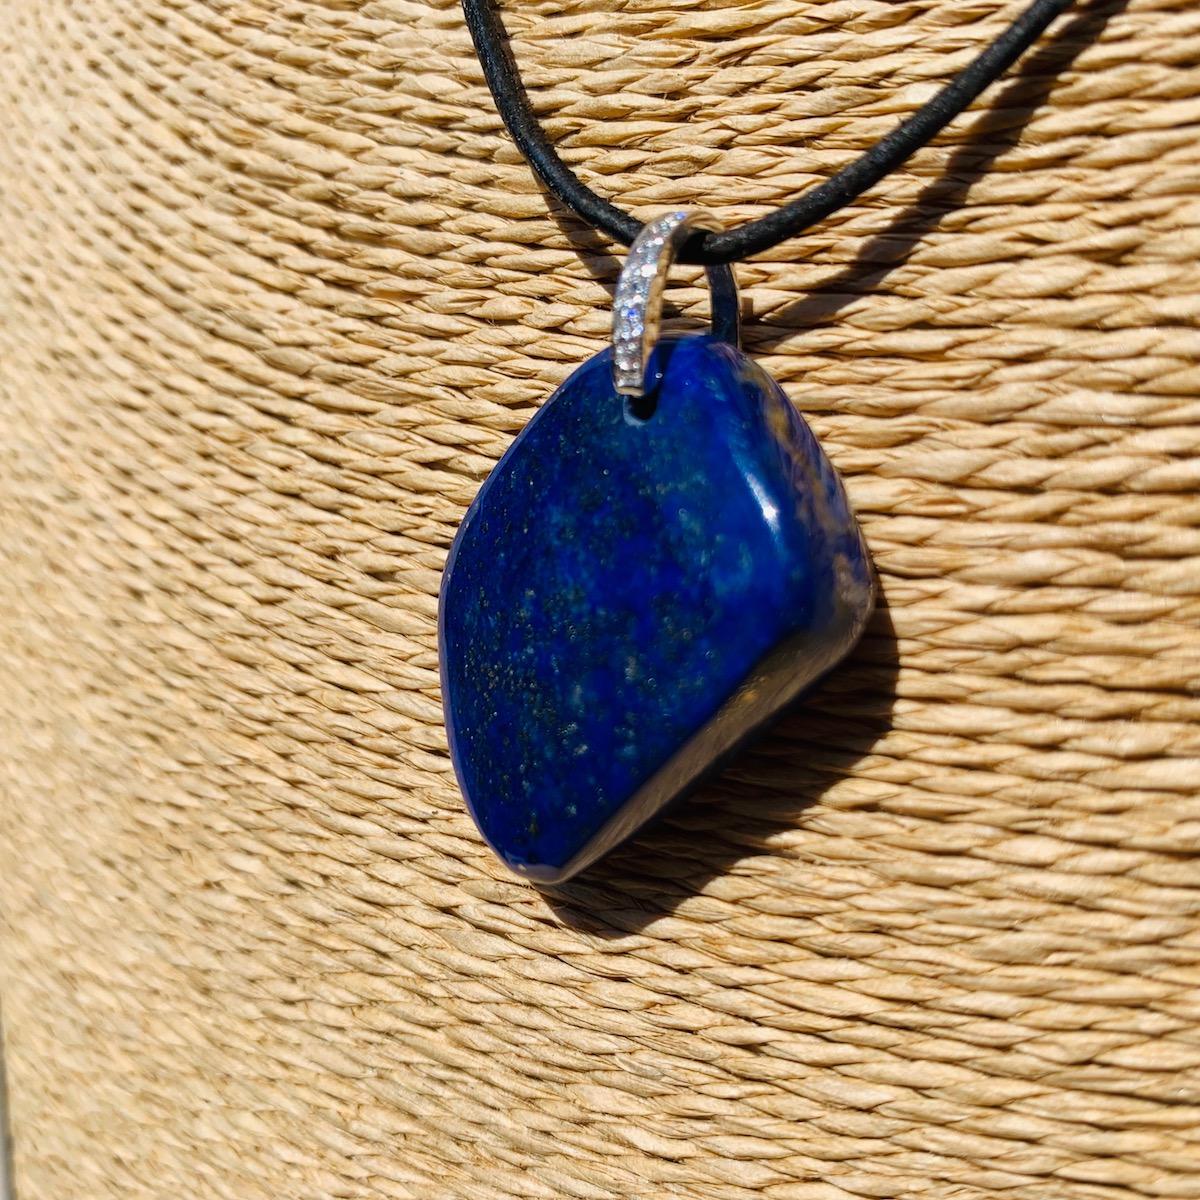 Pendentif contemporain forme libre en Lapis Lazuli